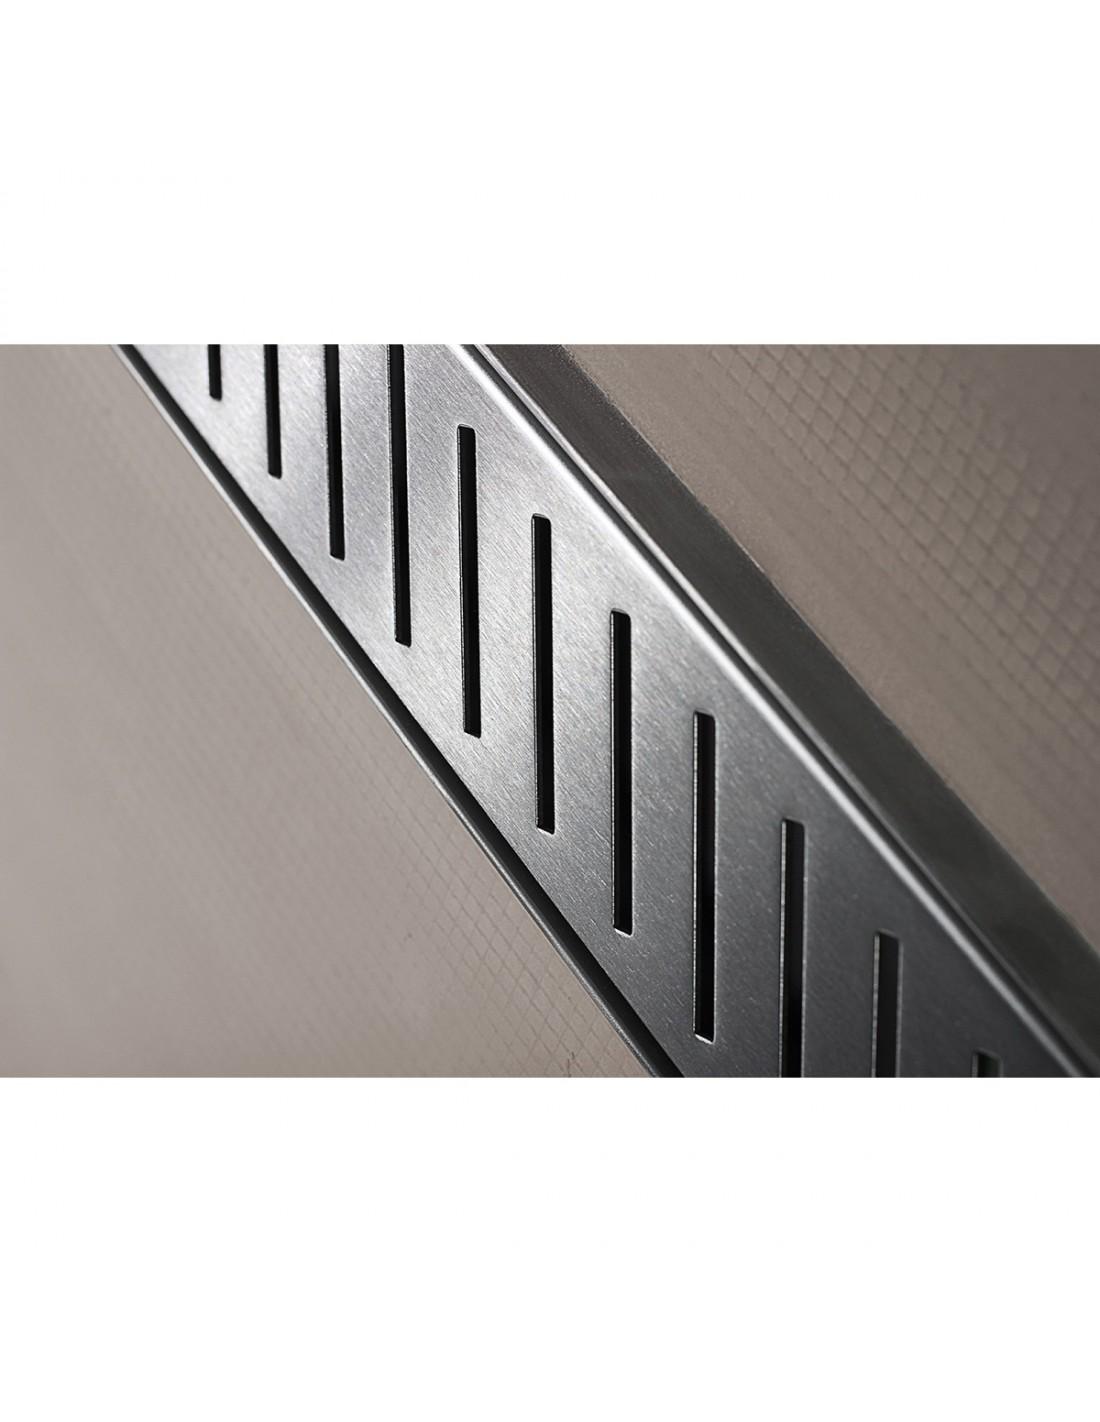 bodengleiche dusche platte wiper 900 x 900 mm linie tivano modernedusche. Black Bedroom Furniture Sets. Home Design Ideas